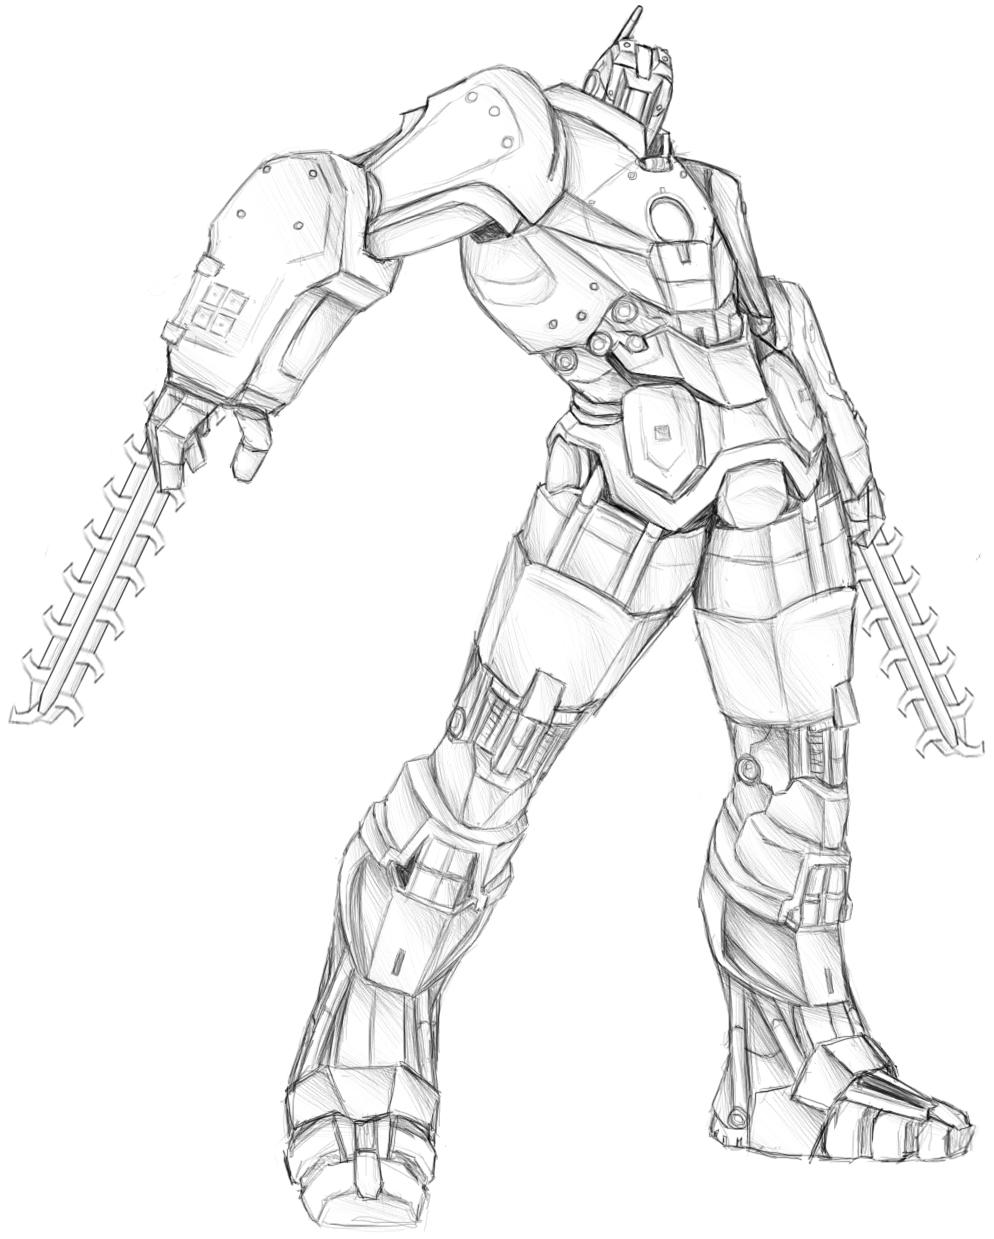 Marine Hammer Drone .:Sketch:. by Sparkleee-Sprinkle